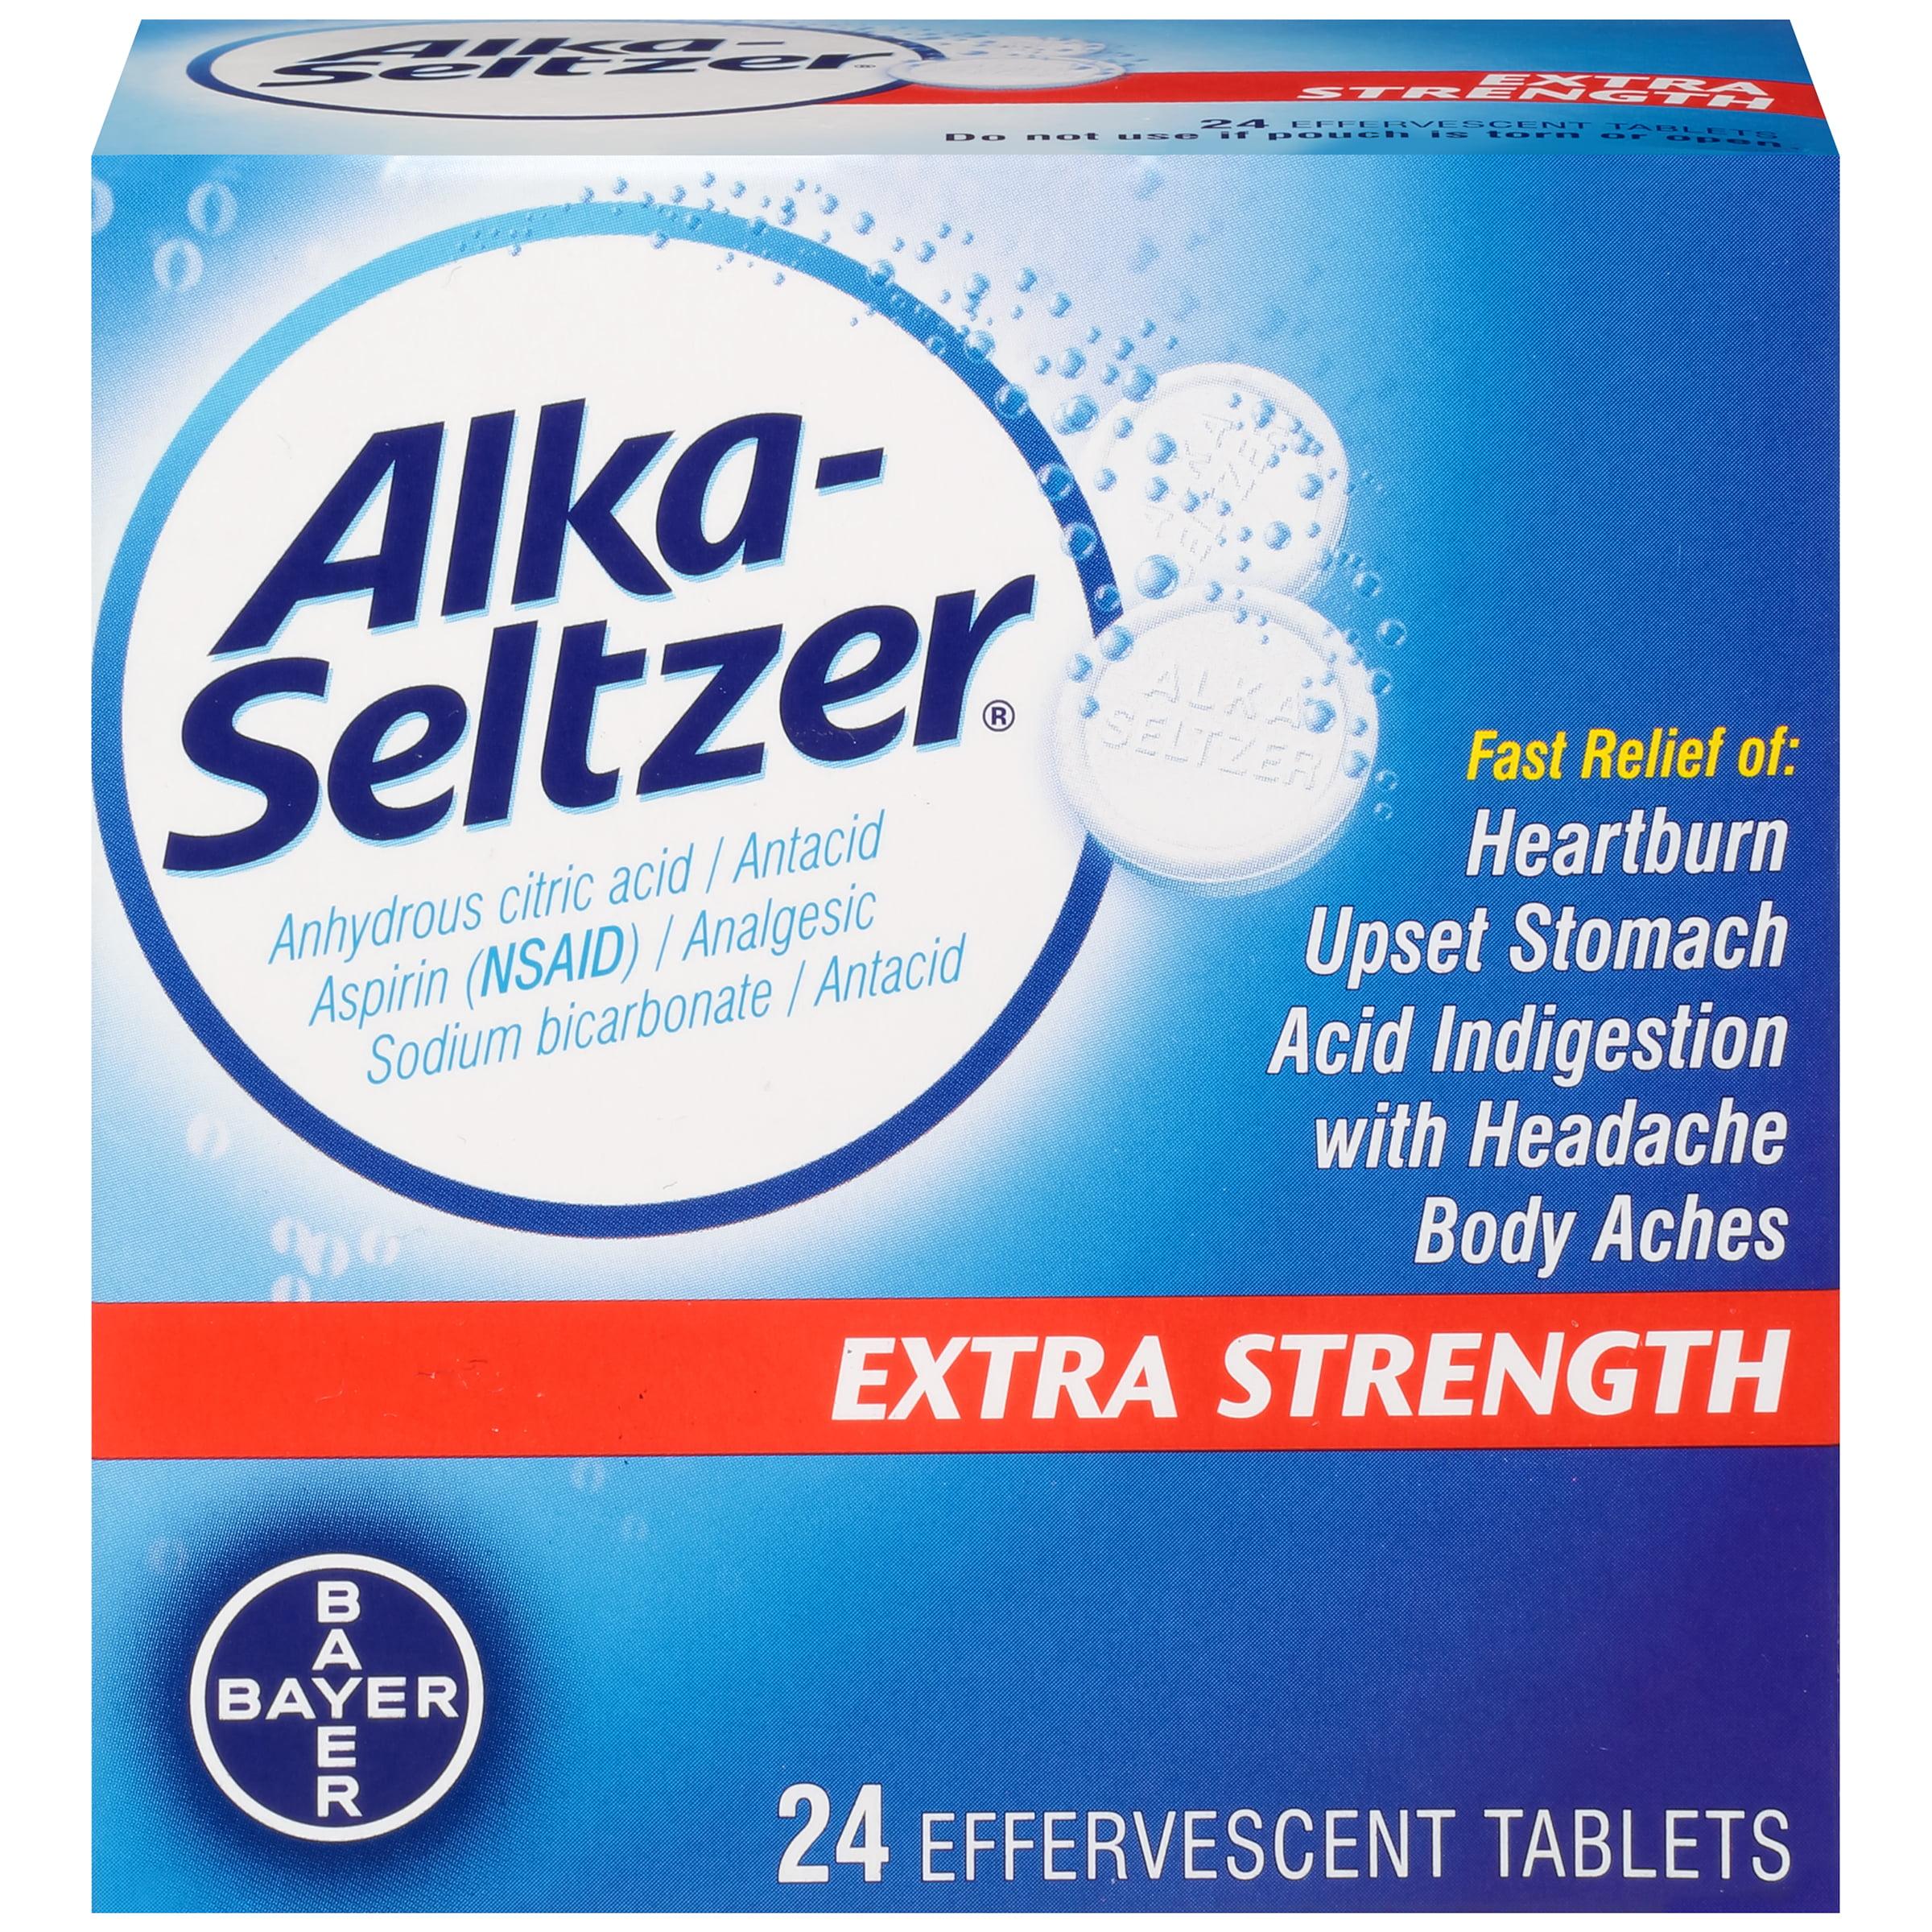 Alka-Seltzer Extra Strength Effervescent Tablets, 24 Count